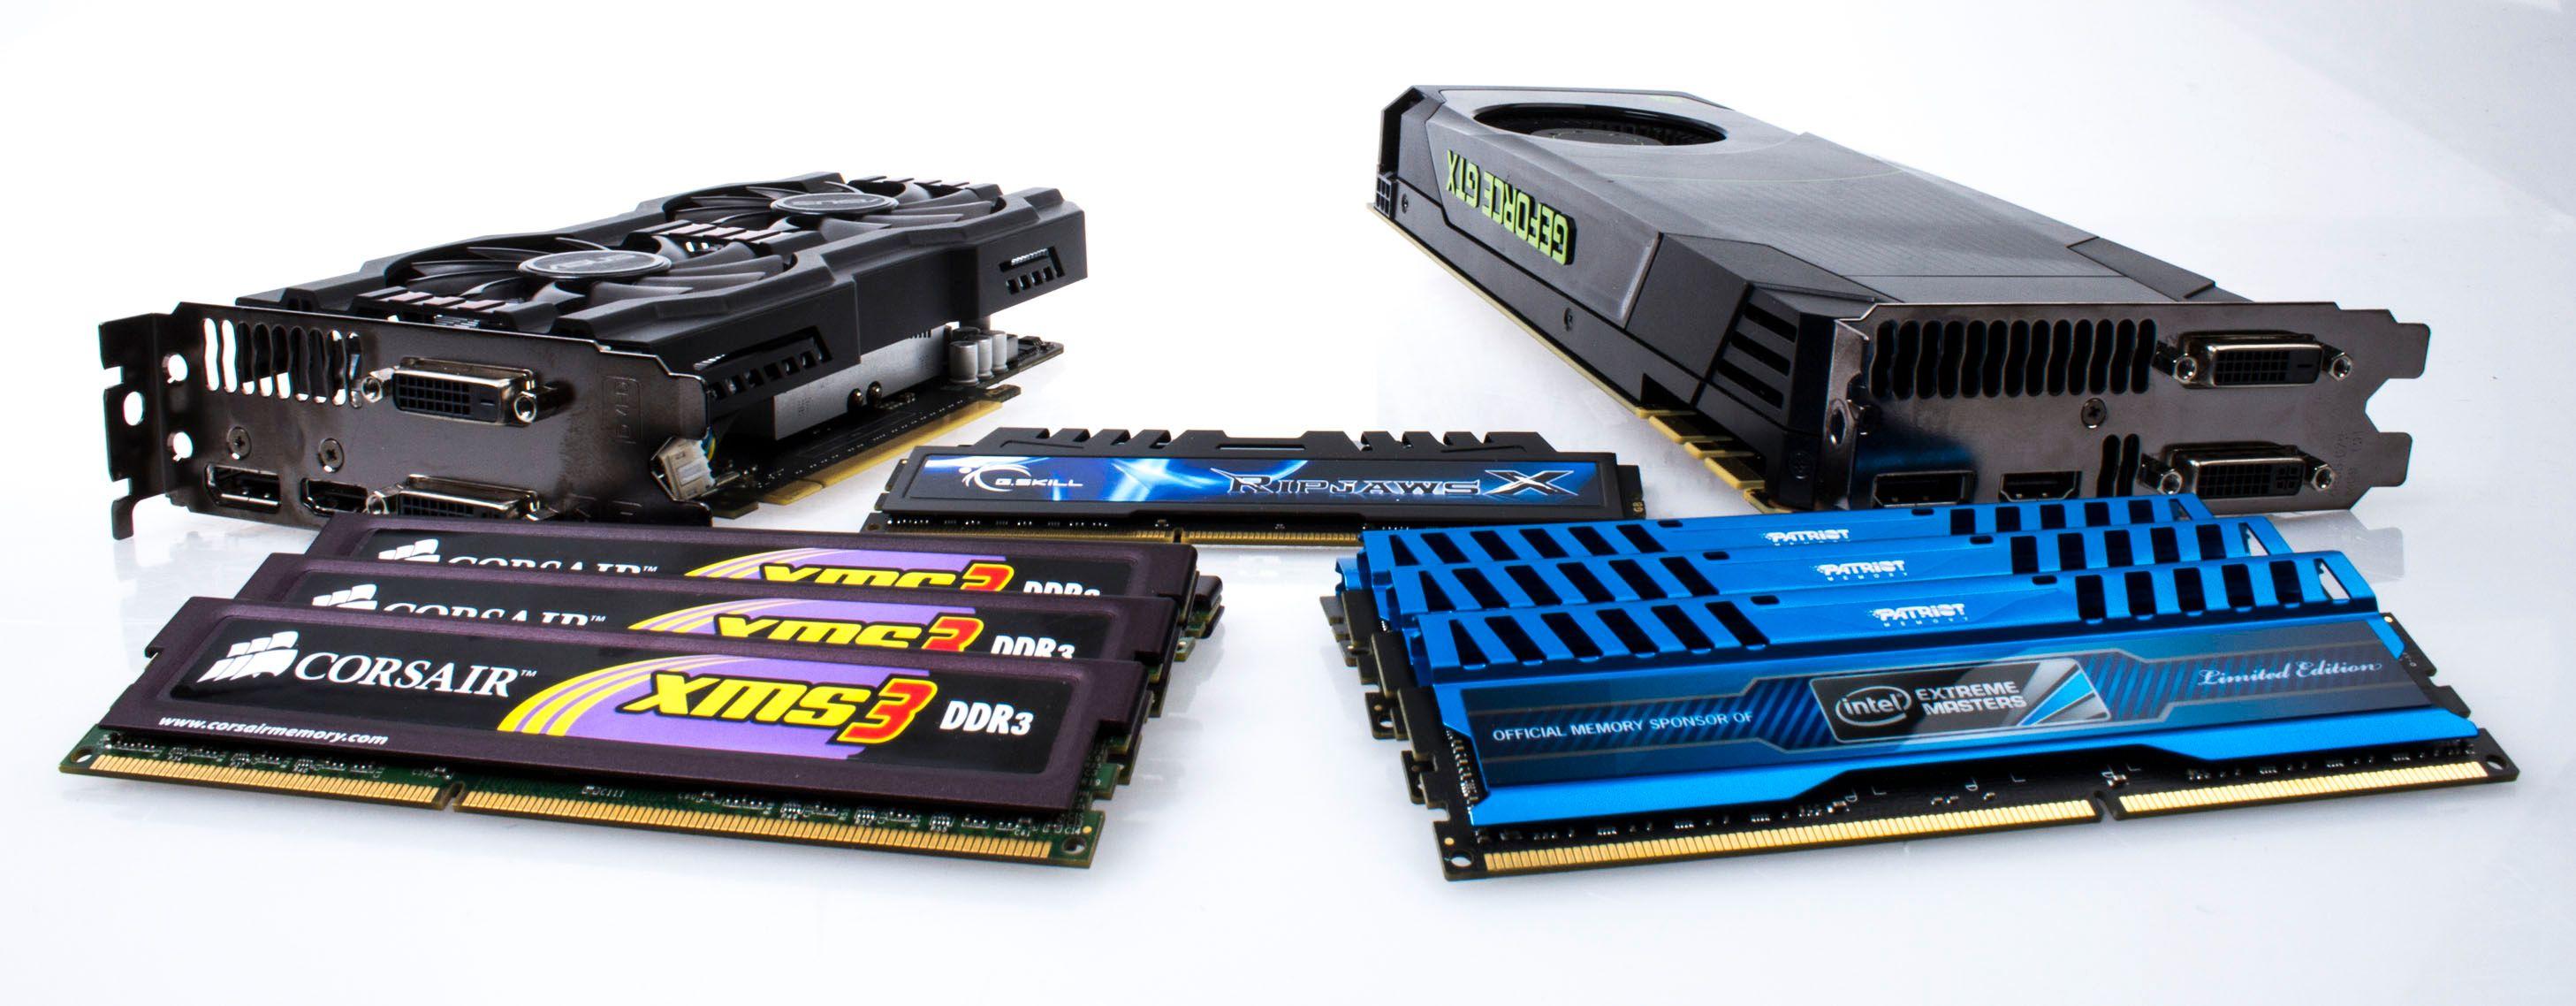 Vi tipper minnebyttet vil fungere langt bedre med et par grovkalibrede skjermkort i spillmaskinen.Foto: Varg Aamo, Hardware.no